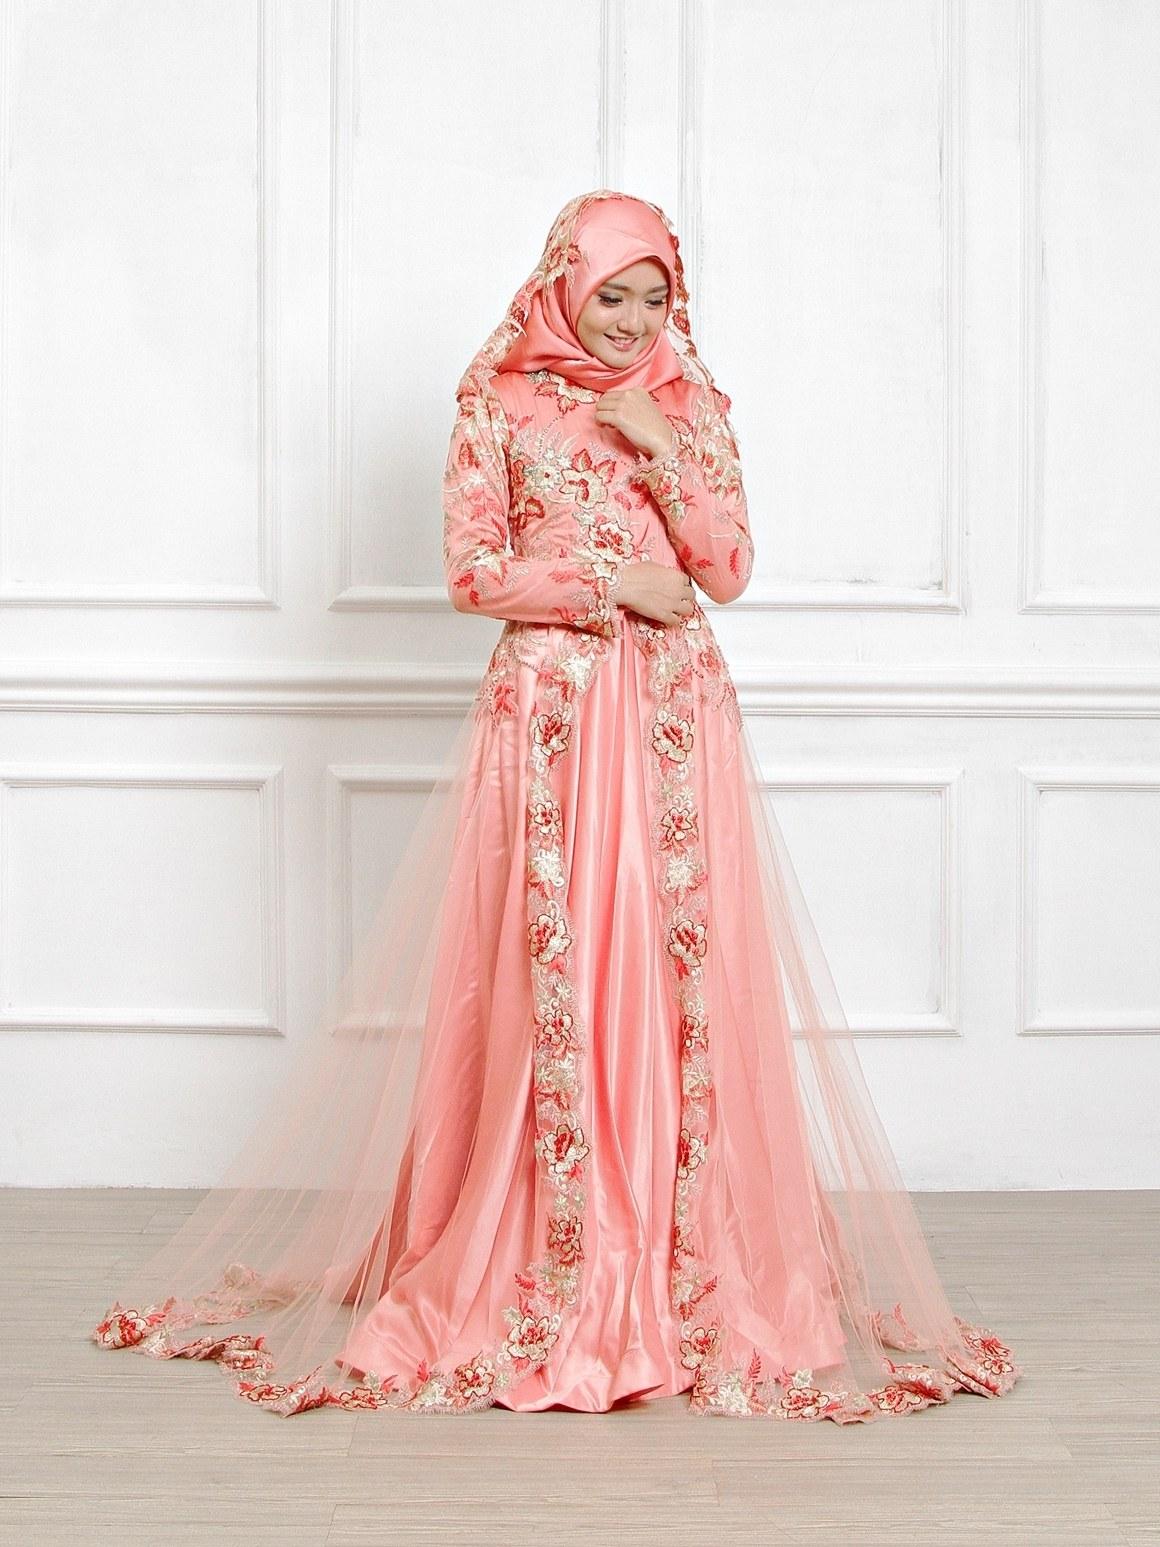 Bentuk Sewa Gaun Pengantin Muslimah Di Bekasi 87dx Gaun Pengantin Muslimah Dress Muslim Pungky Rumah Jahit